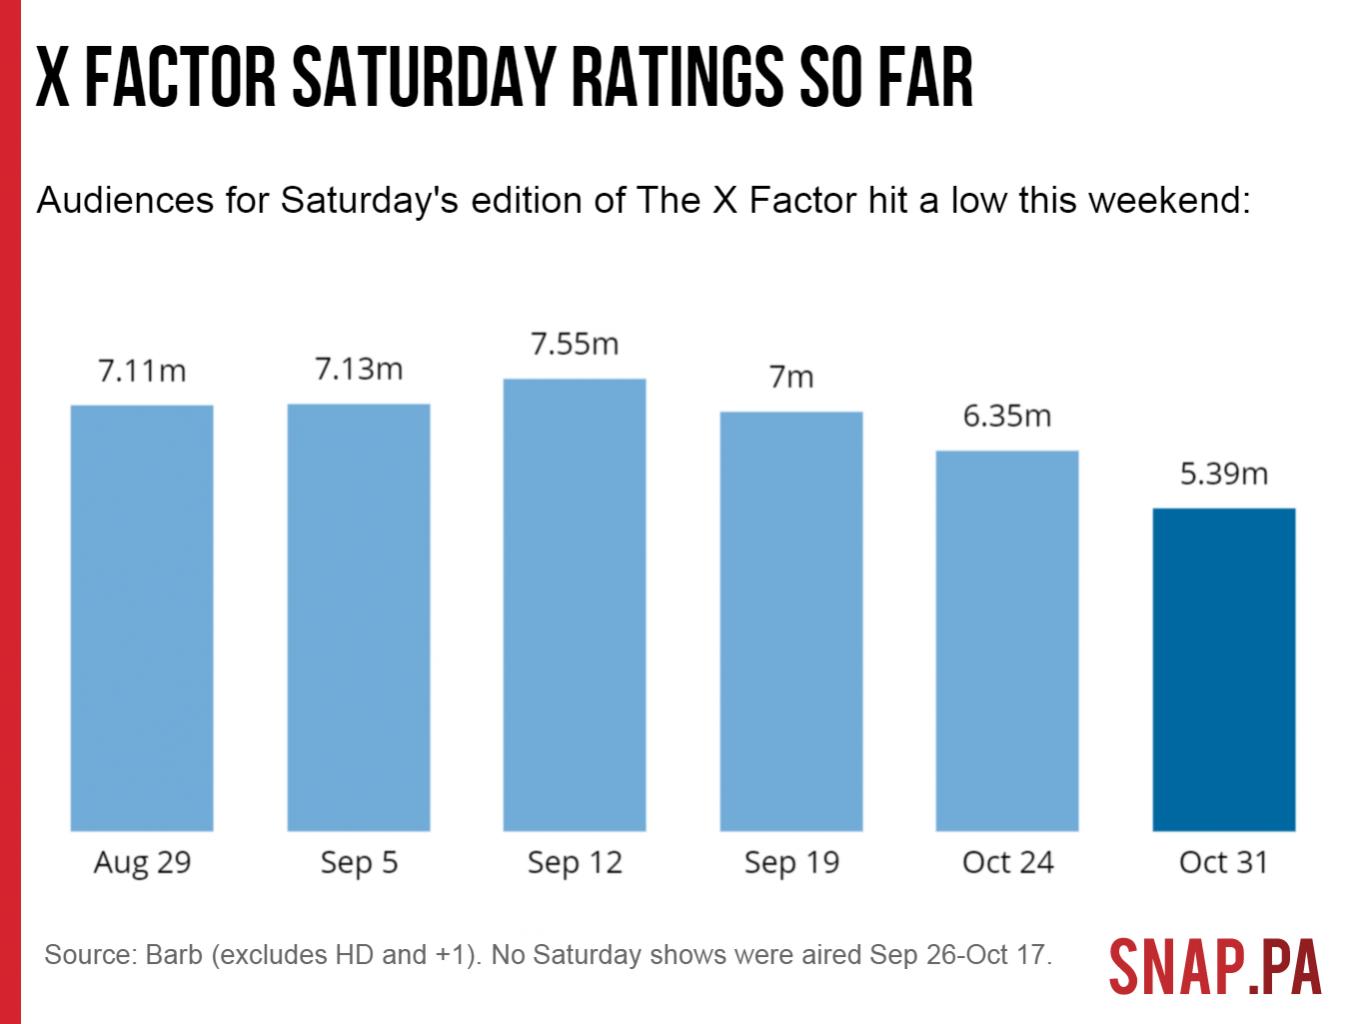 x factor saturday night ratings so far